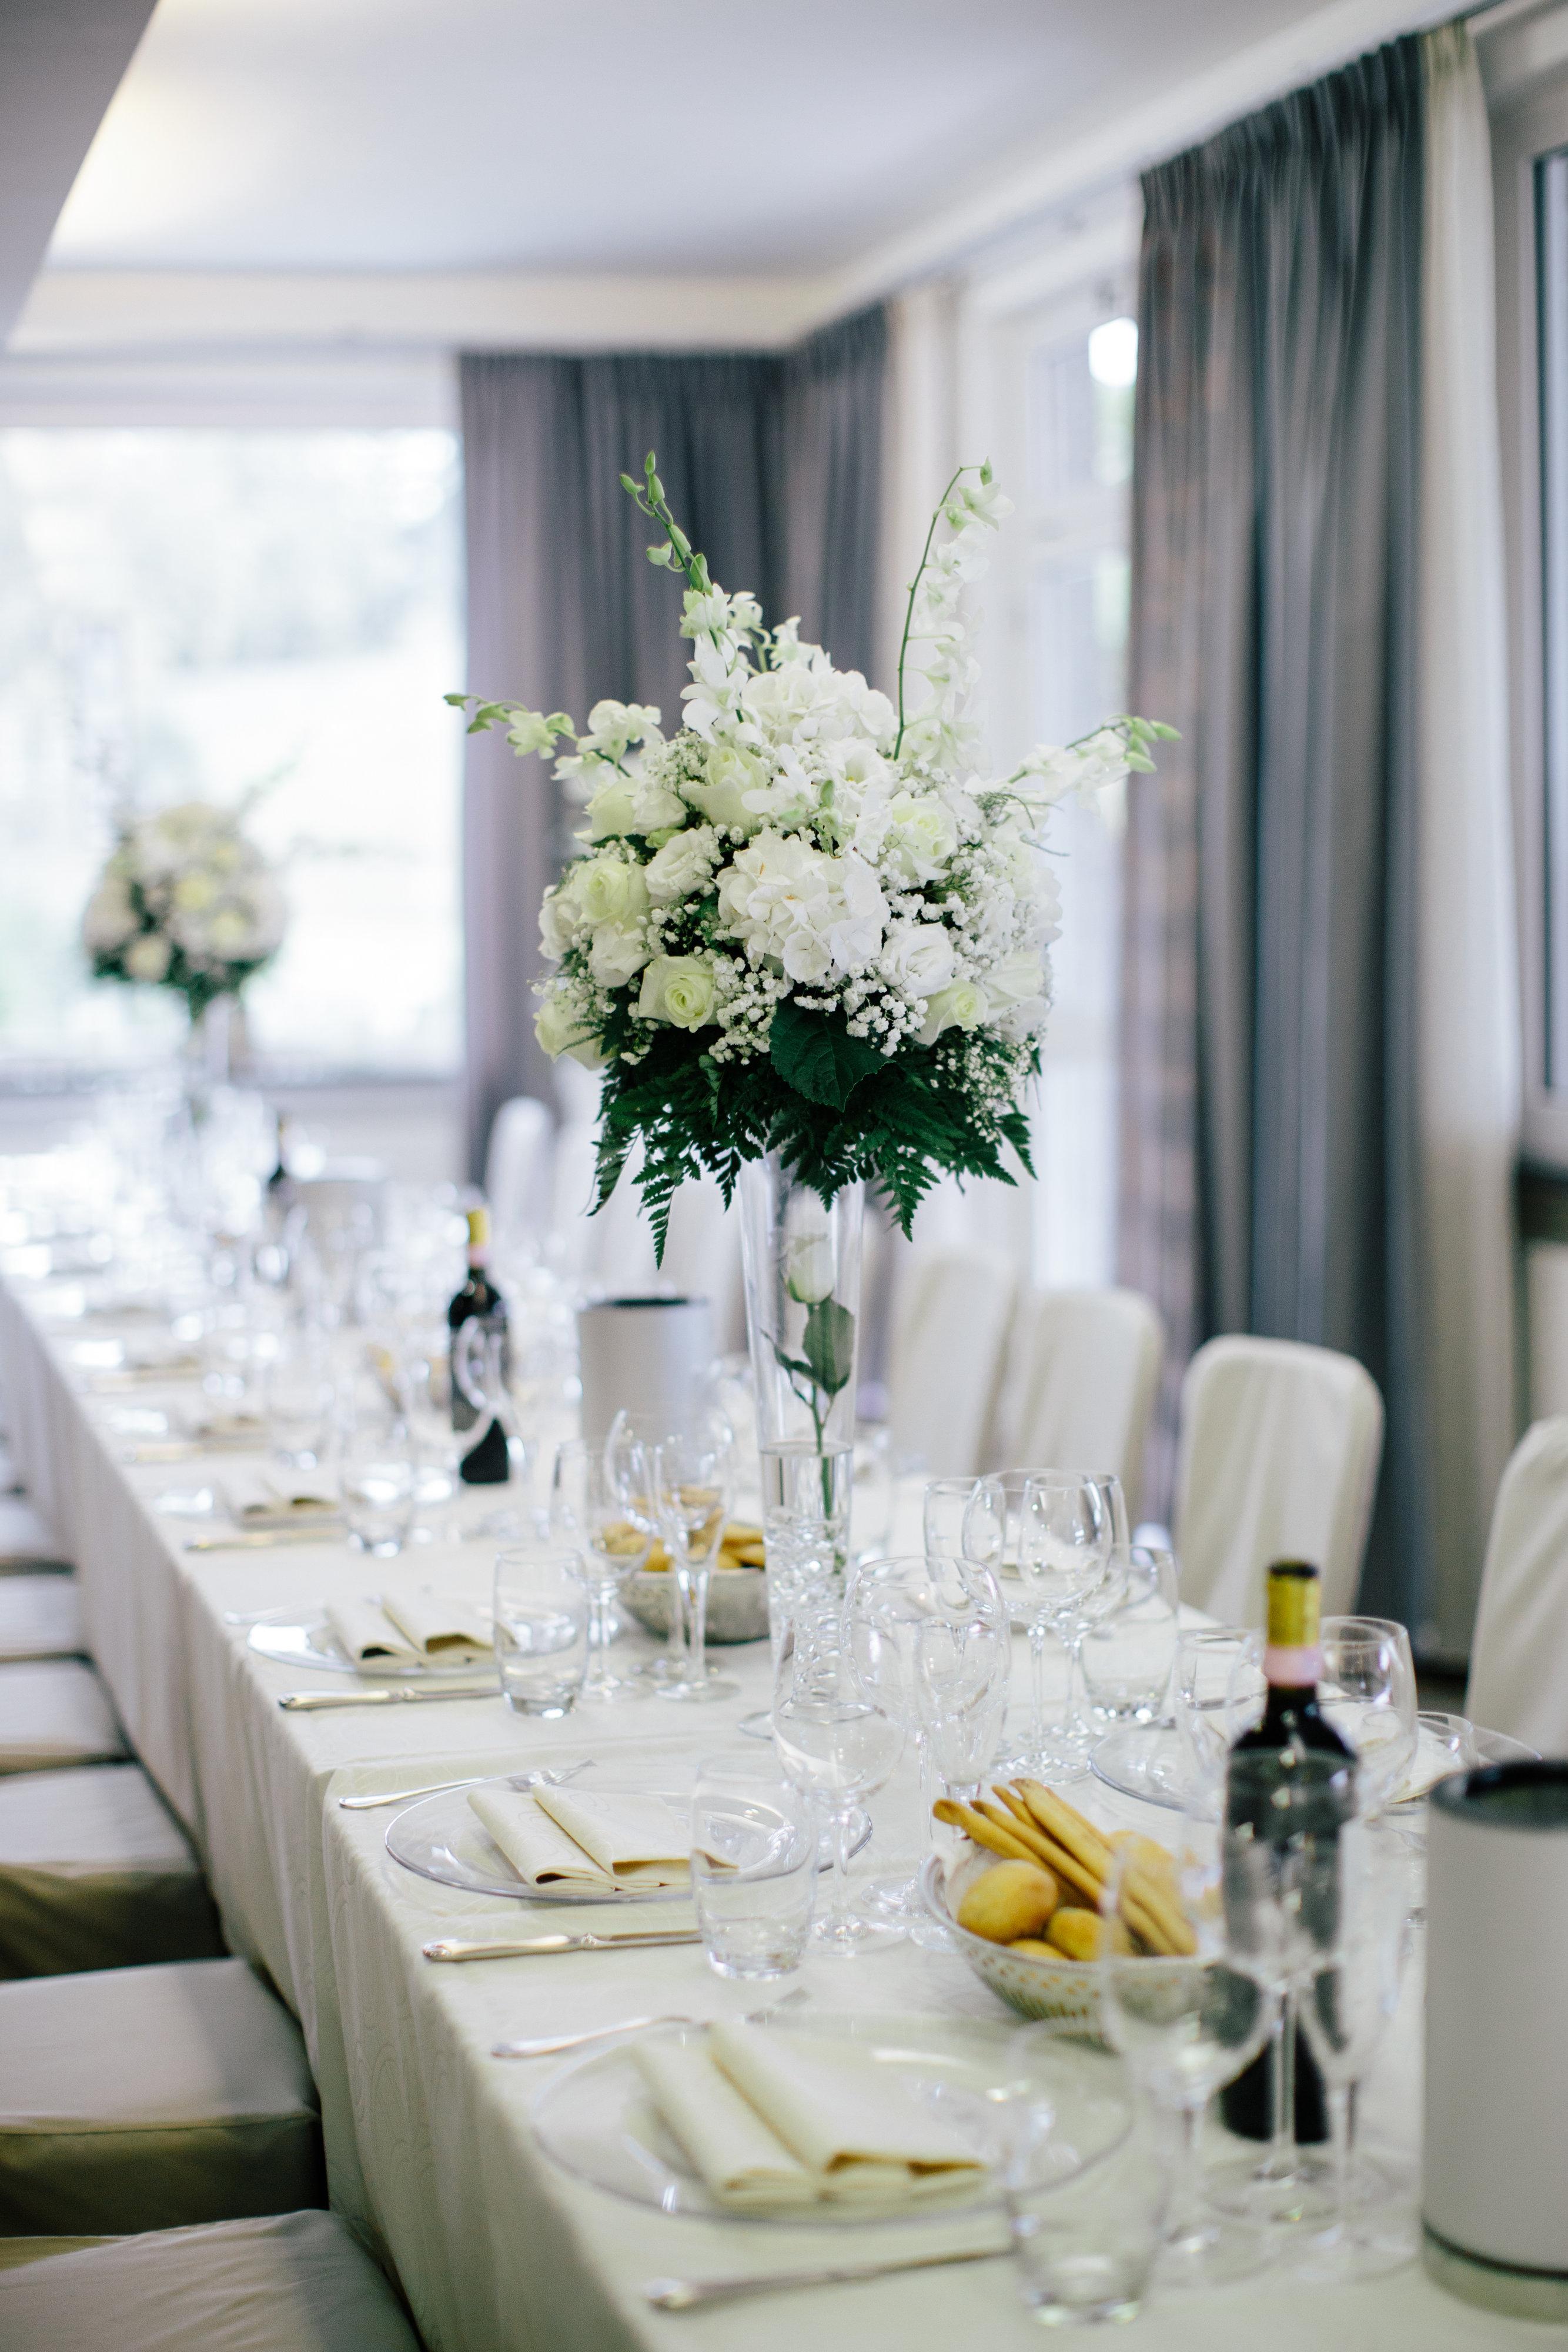 Matrimonio Tema Famiglia : Matrimonio a orta tema tra sala e cucina elisabetta zucchi